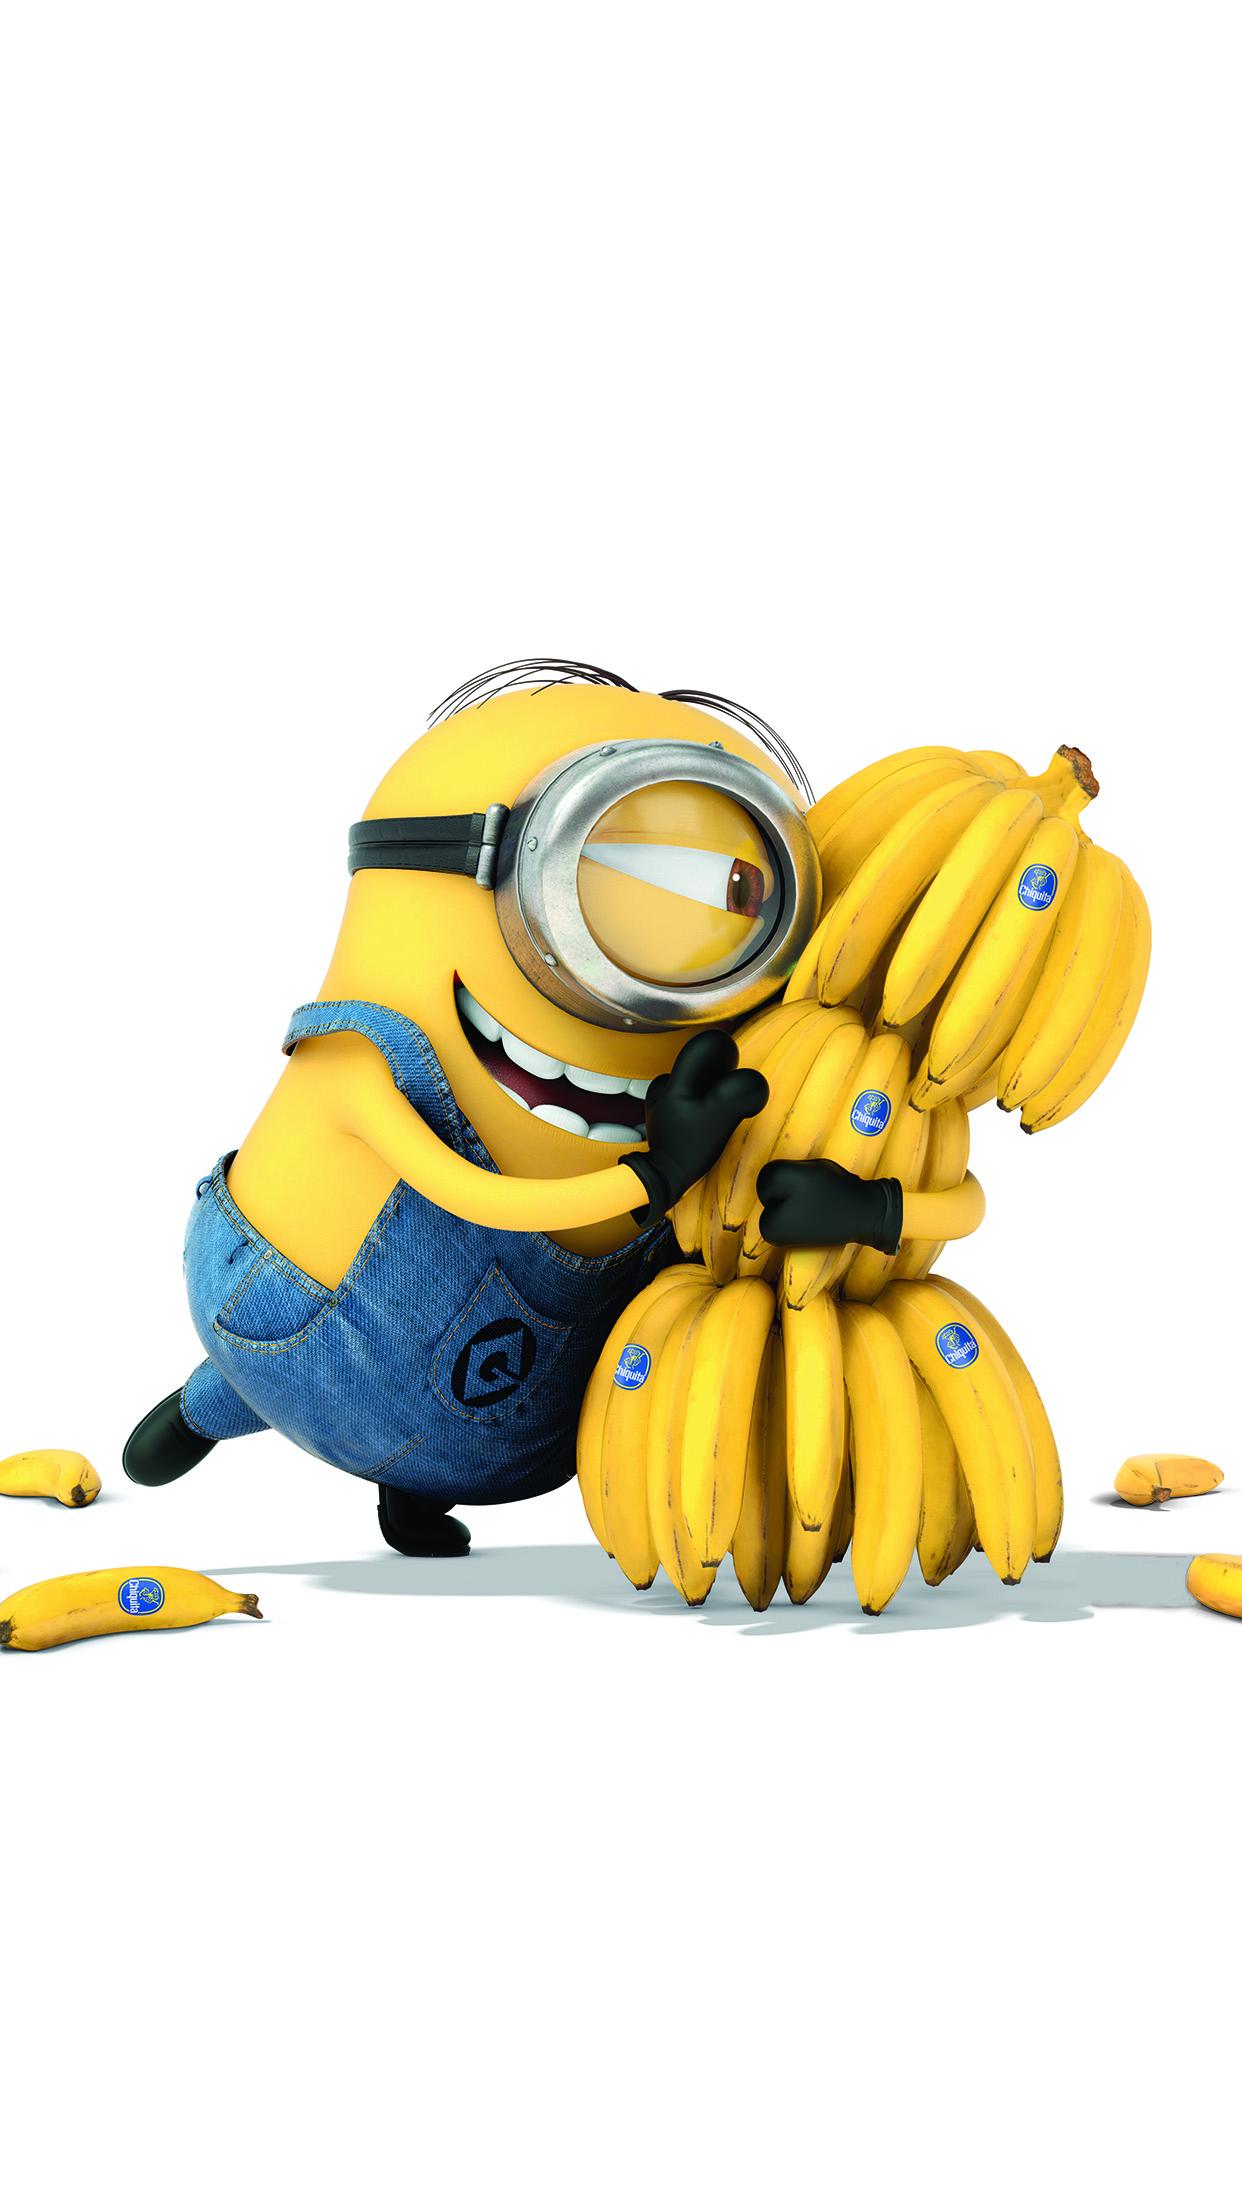 Iphone 6 Plus Retina Wallpaper Ap08 Minions Art Illust Film Cute Banana Yellow Papers Co